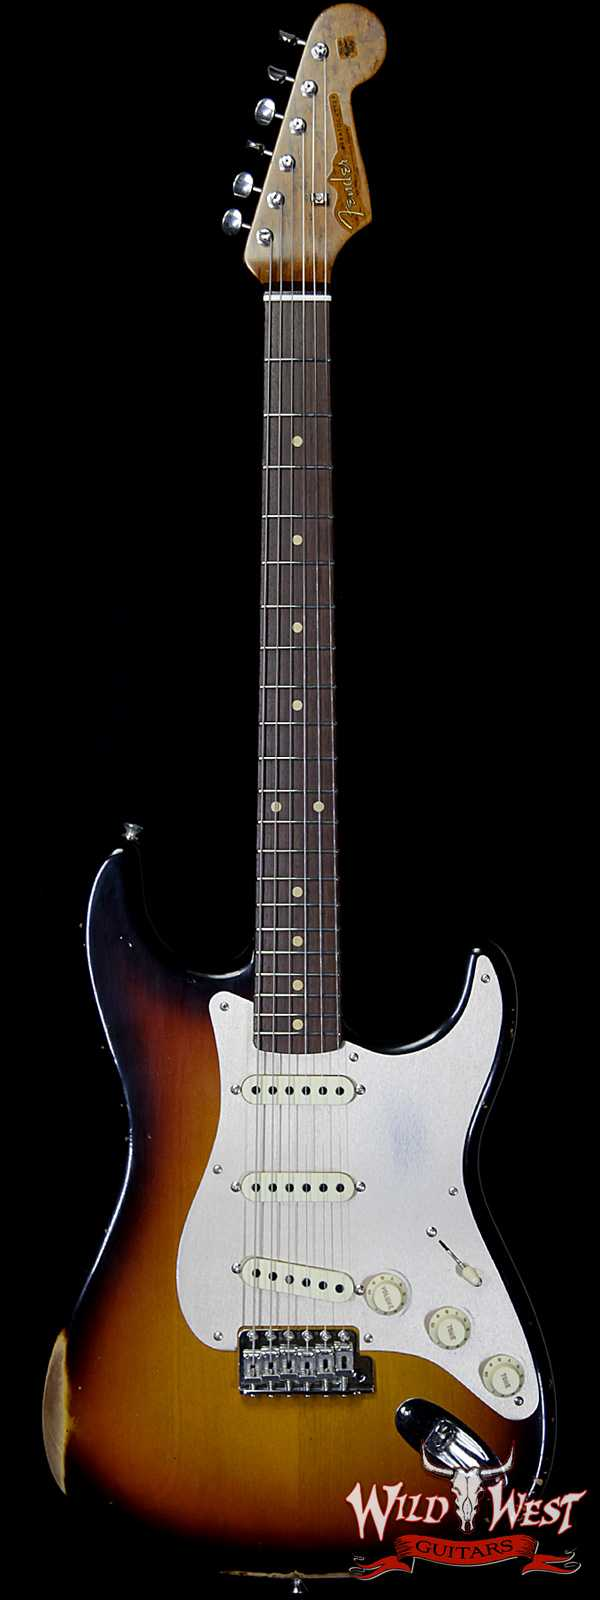 Fender Custom Shop Roasted 1960 Stratocaster Relic Birdseye Neck AAA Rosewood Slab Board 3 Tone Sunburst